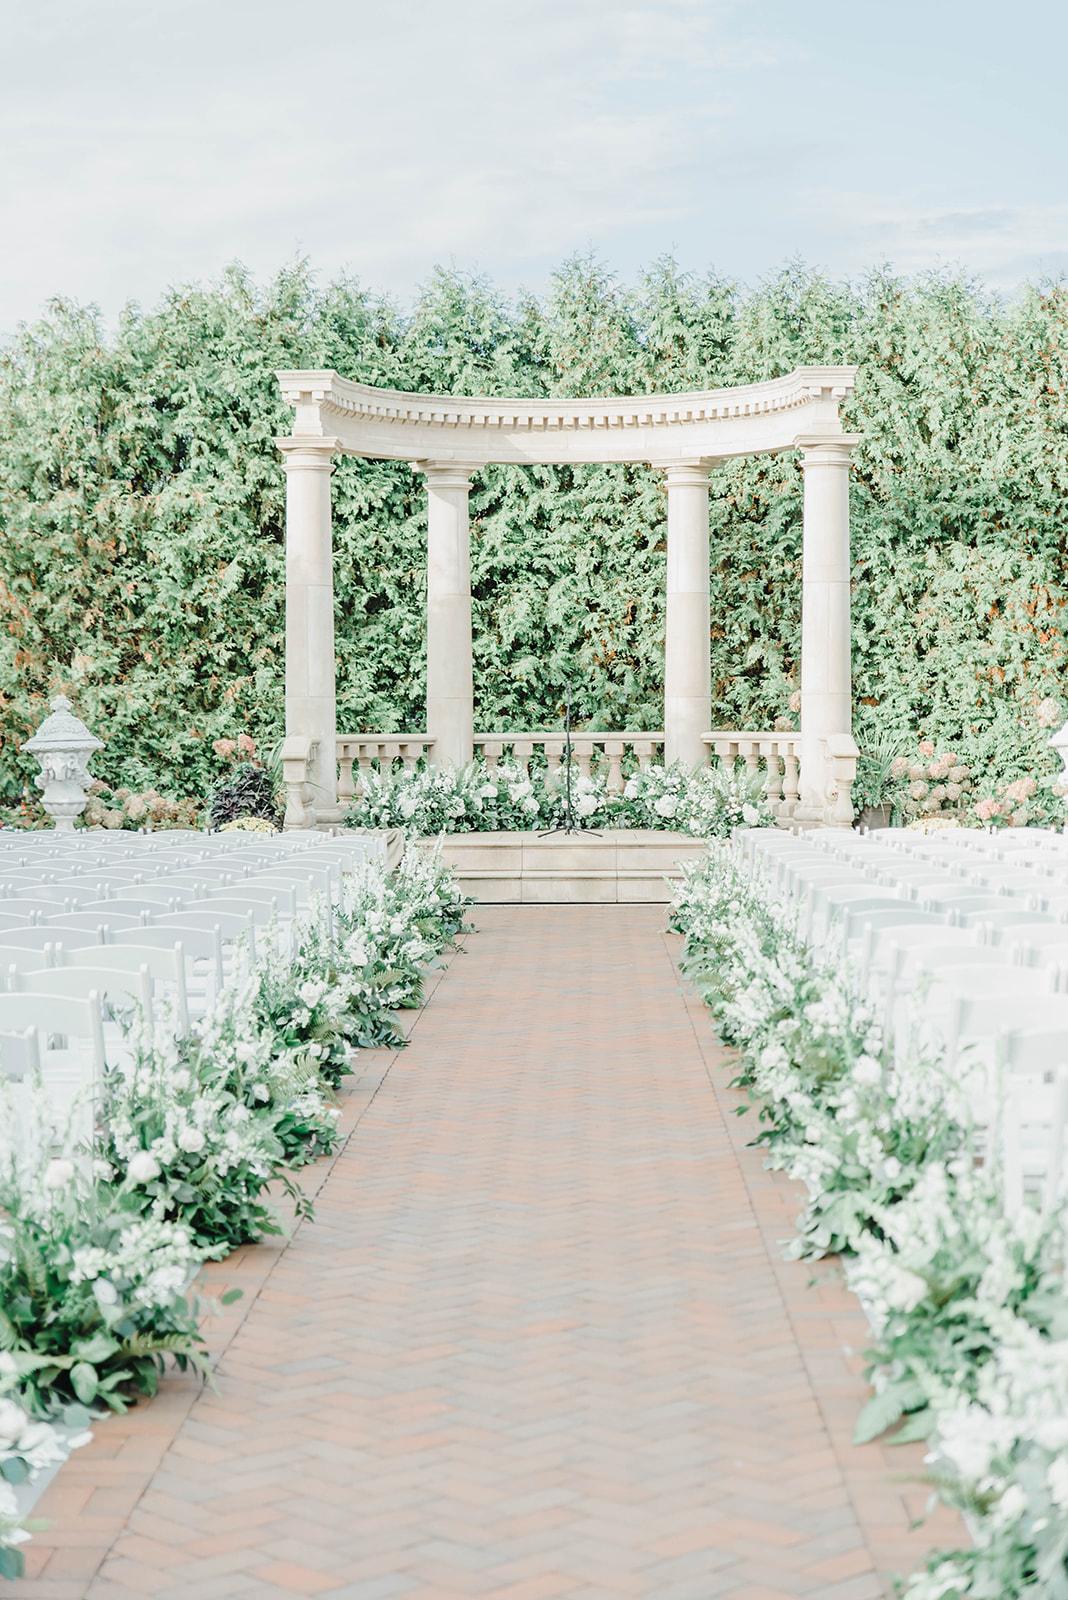 Gorgeous Living Wedding Aisle Decor Ideas  by Bride & Blossom